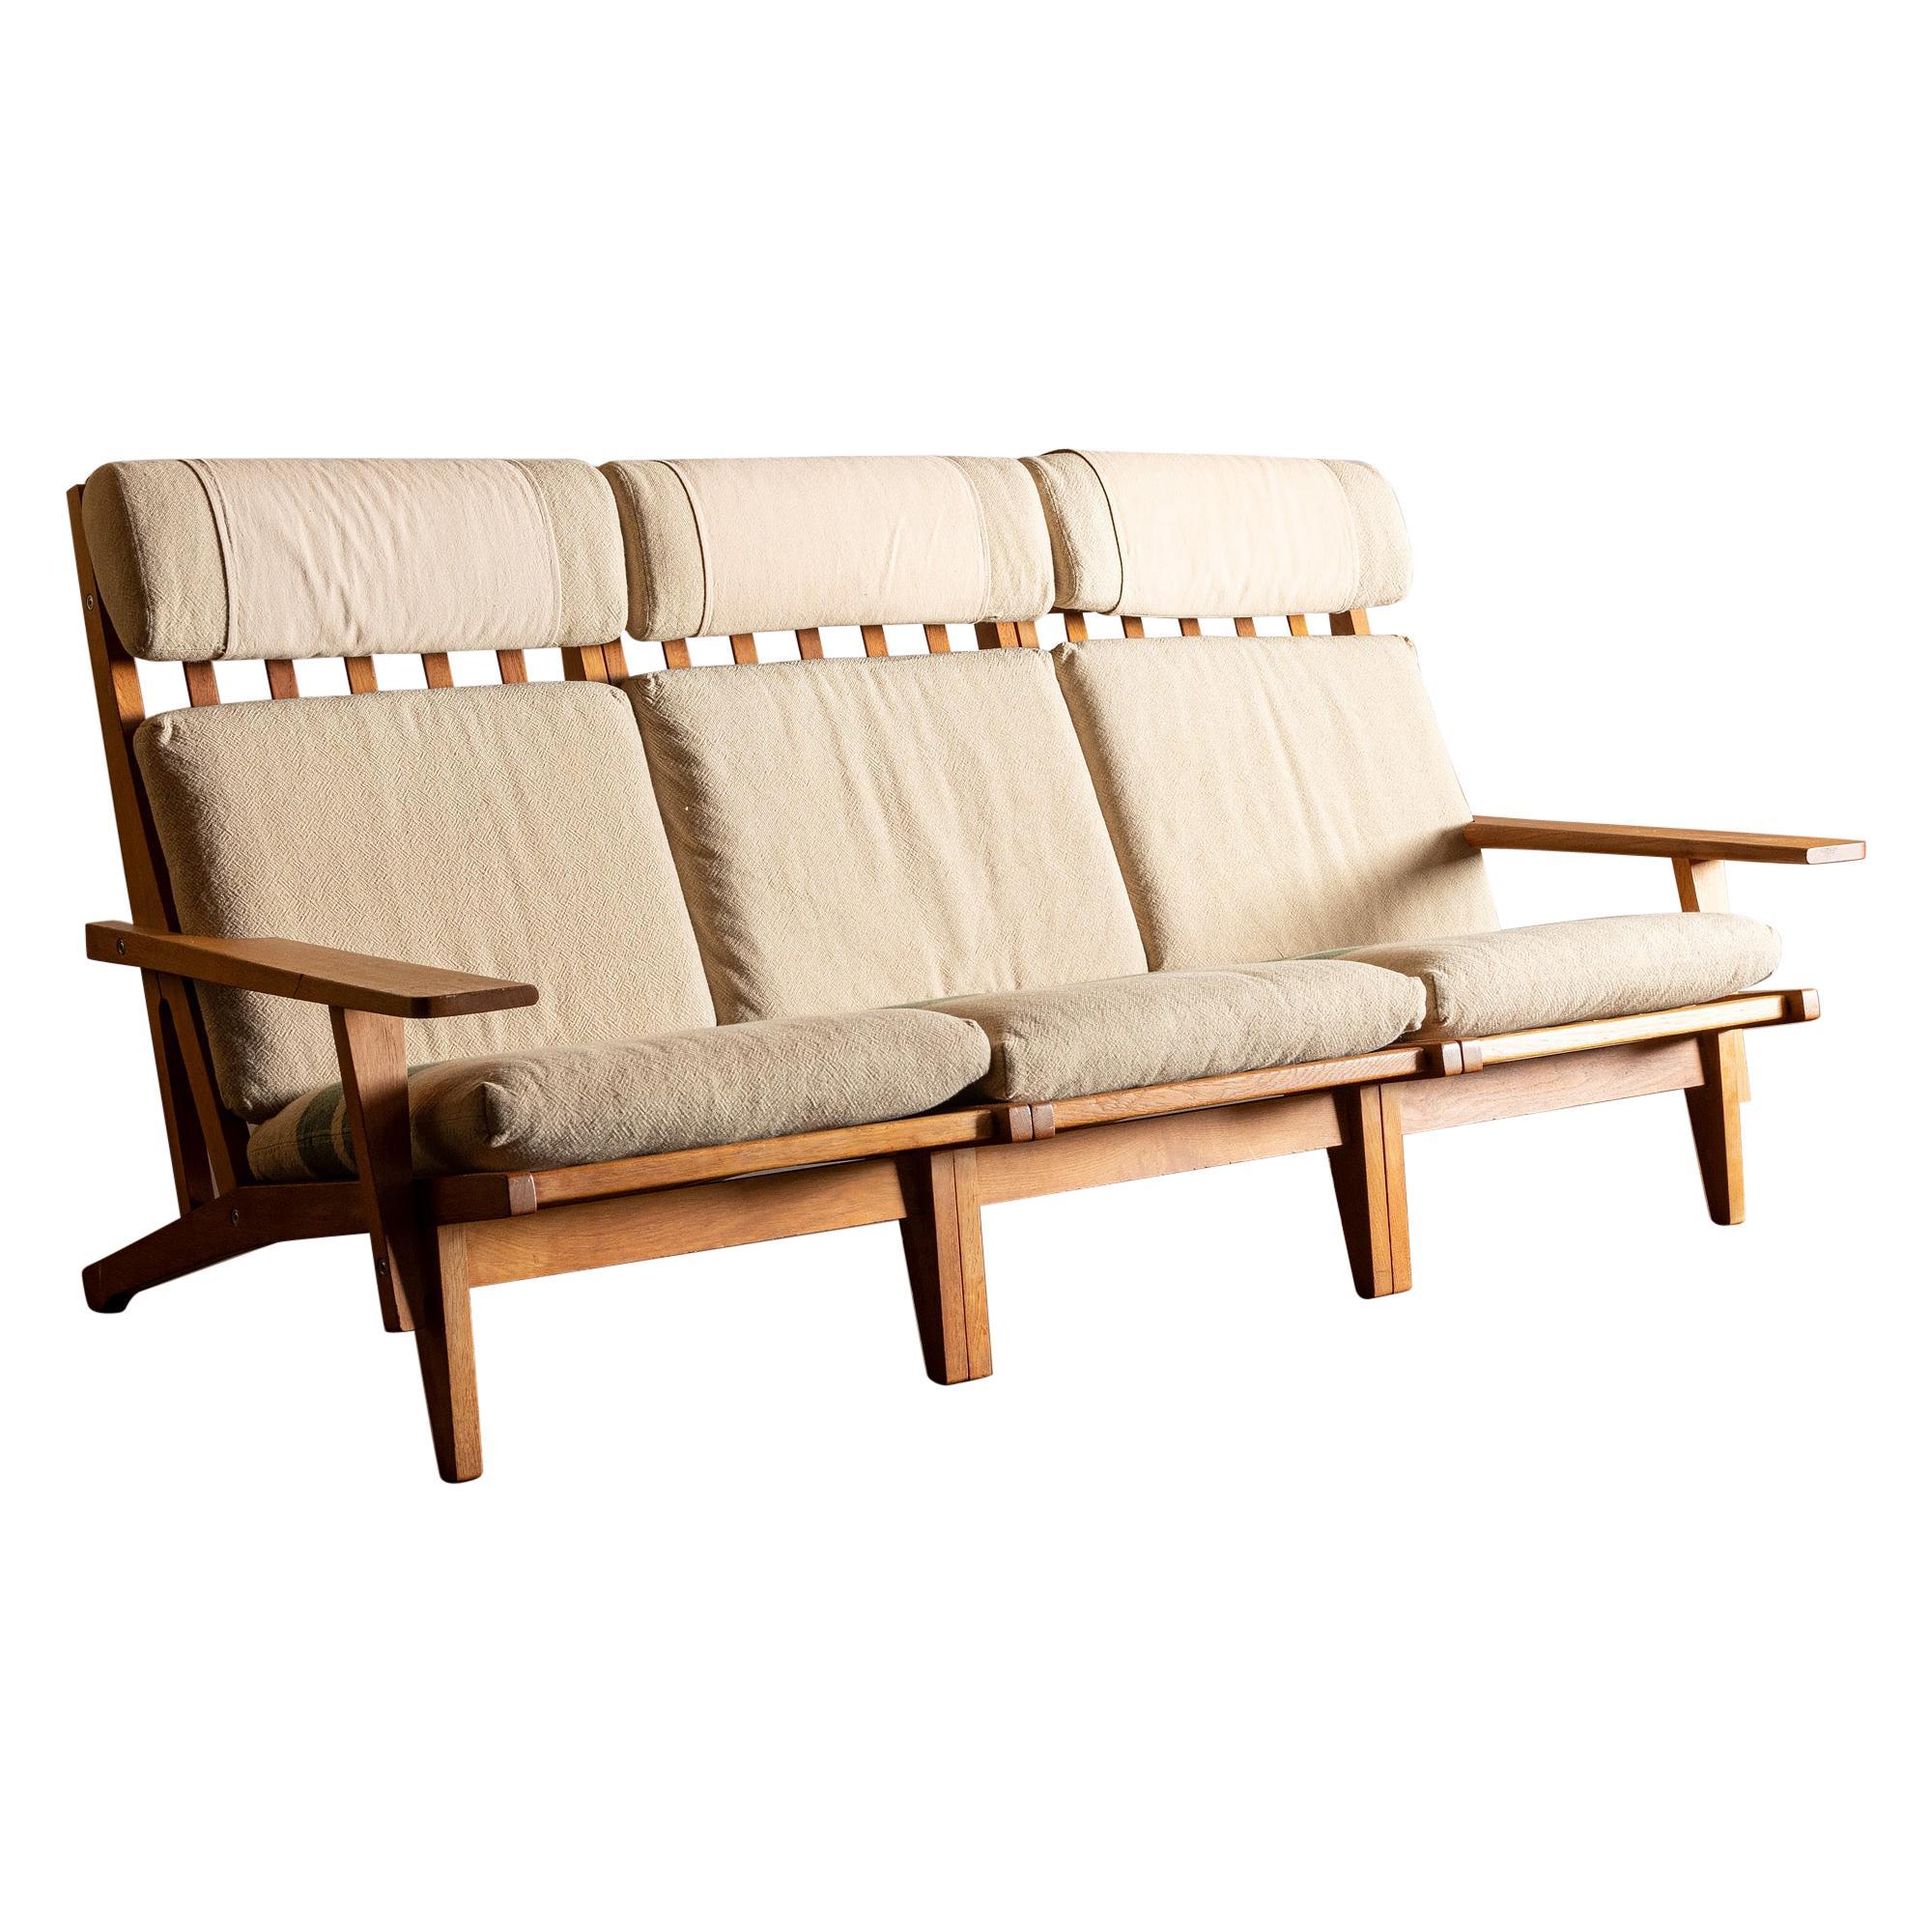 Hans Wegner GE 375 Three-Seat Sofa in Oak, Denmark, 1960s